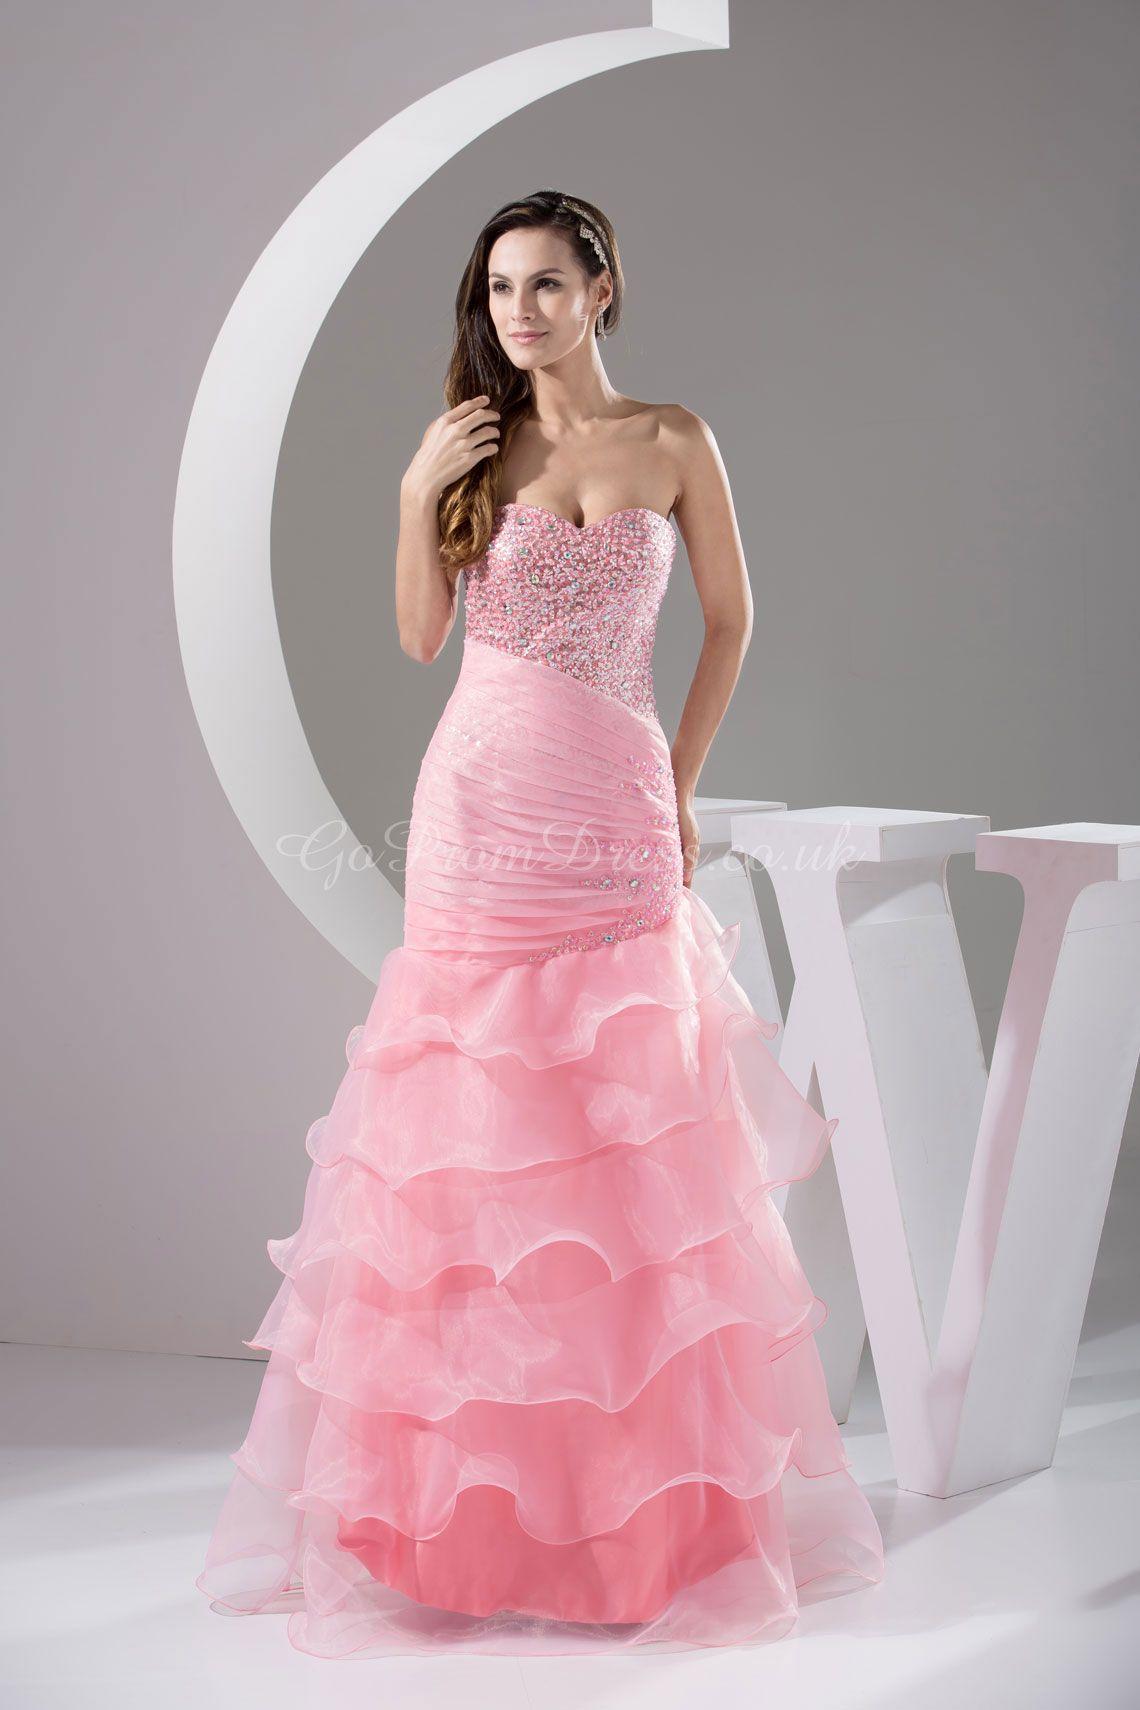 Prom dress prom dresses prom dress prom dress prom dresses prom